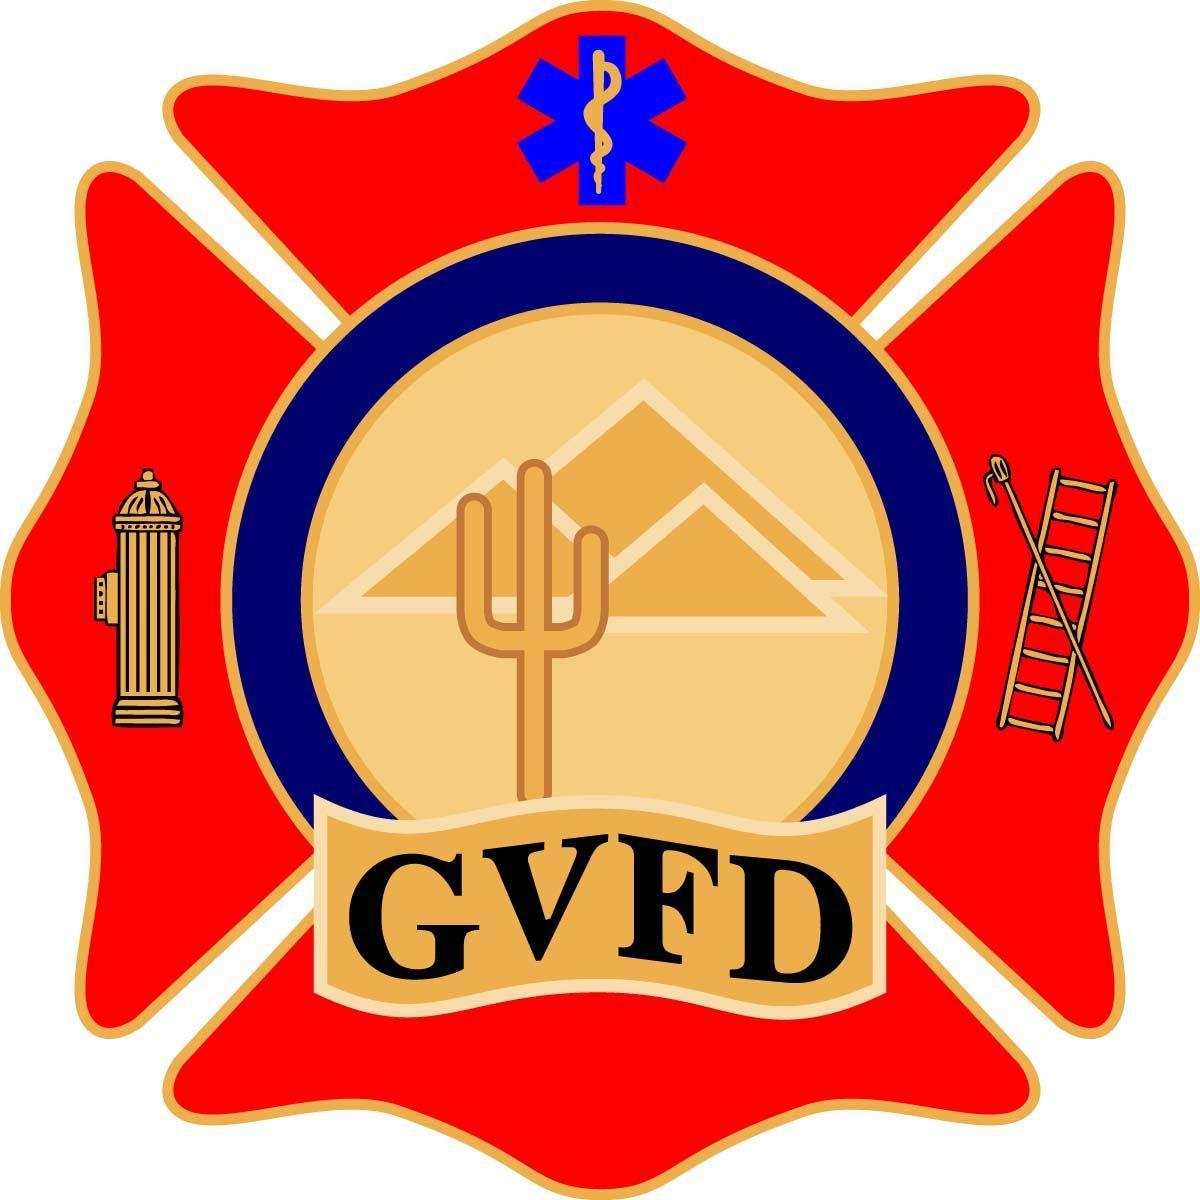 Gvfd nurse practitioner program sees 170 patients local news nurse practitioner update biocorpaavc